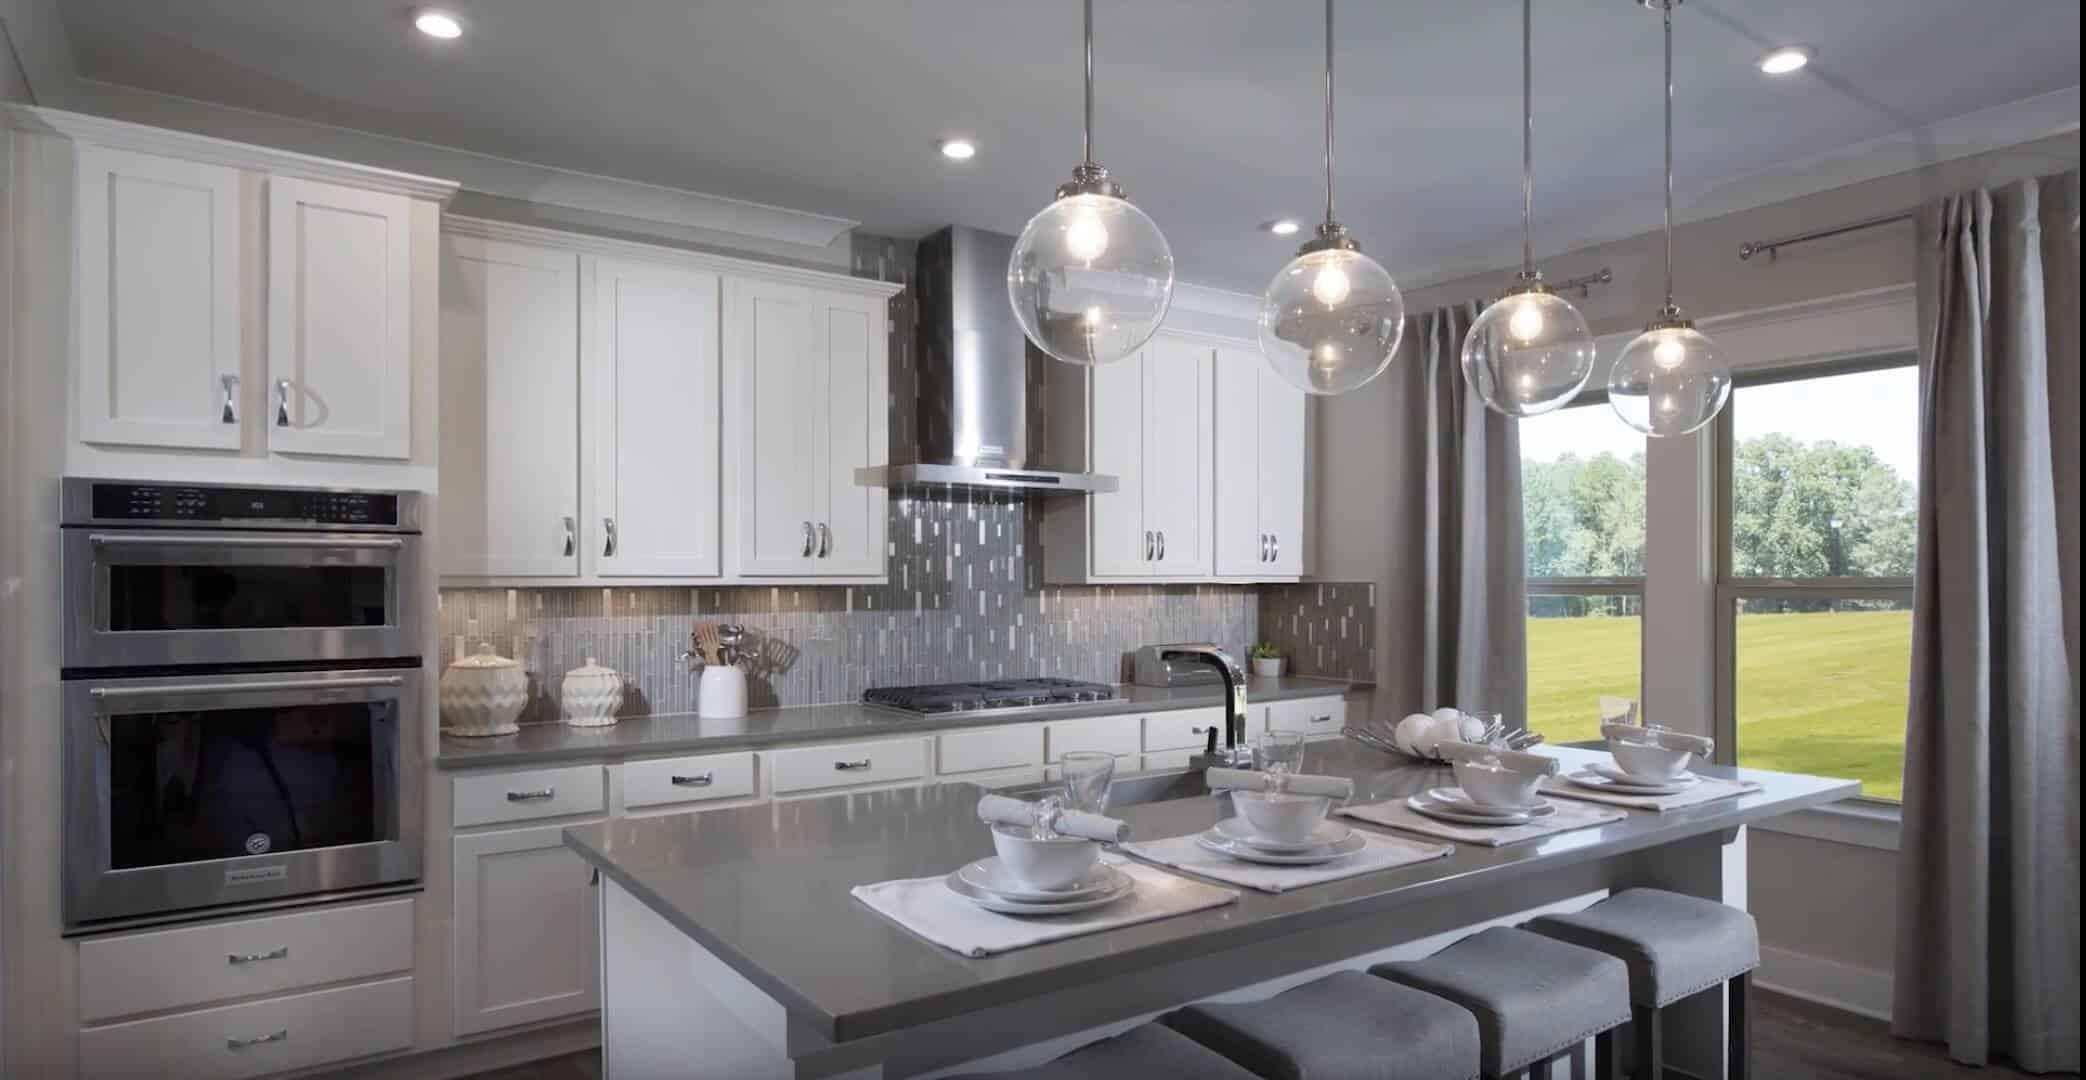 Arbor Green Meritage Homes Sugar Hill Ga Find New Construction In Atlanta And Video